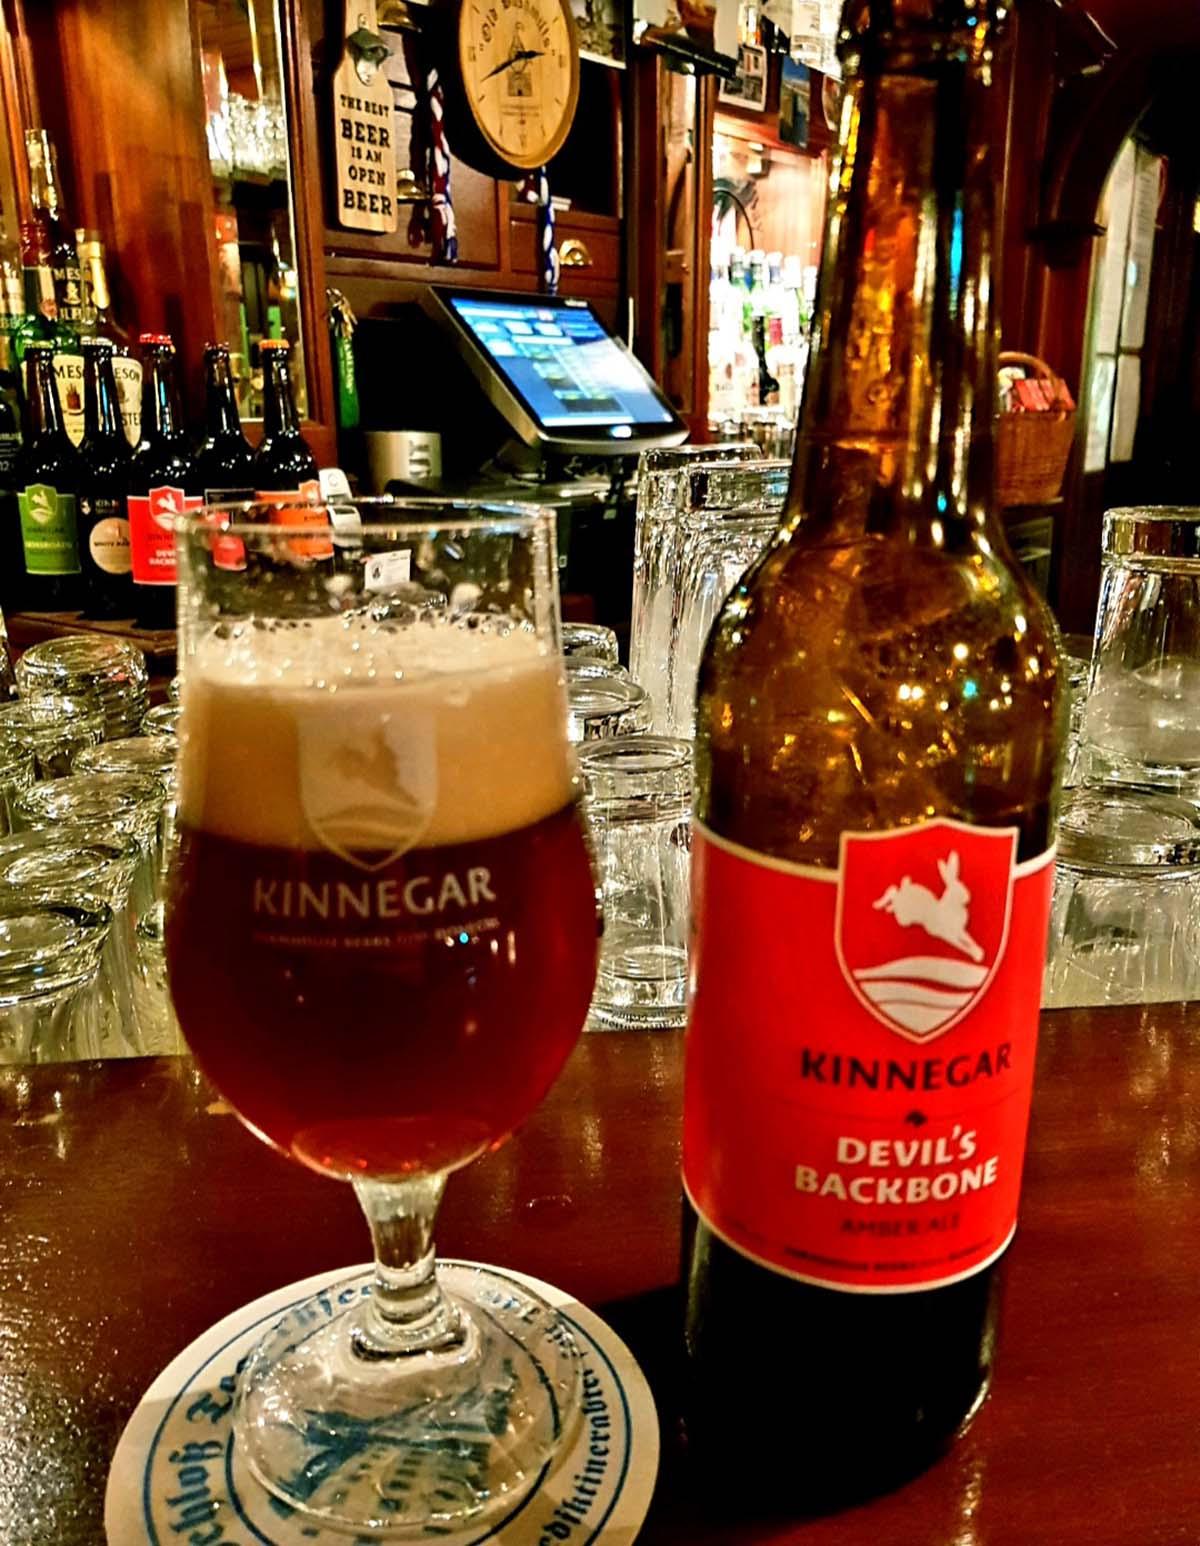 Gallery The Galway Bay Pub Irish Innsbruck Tirol